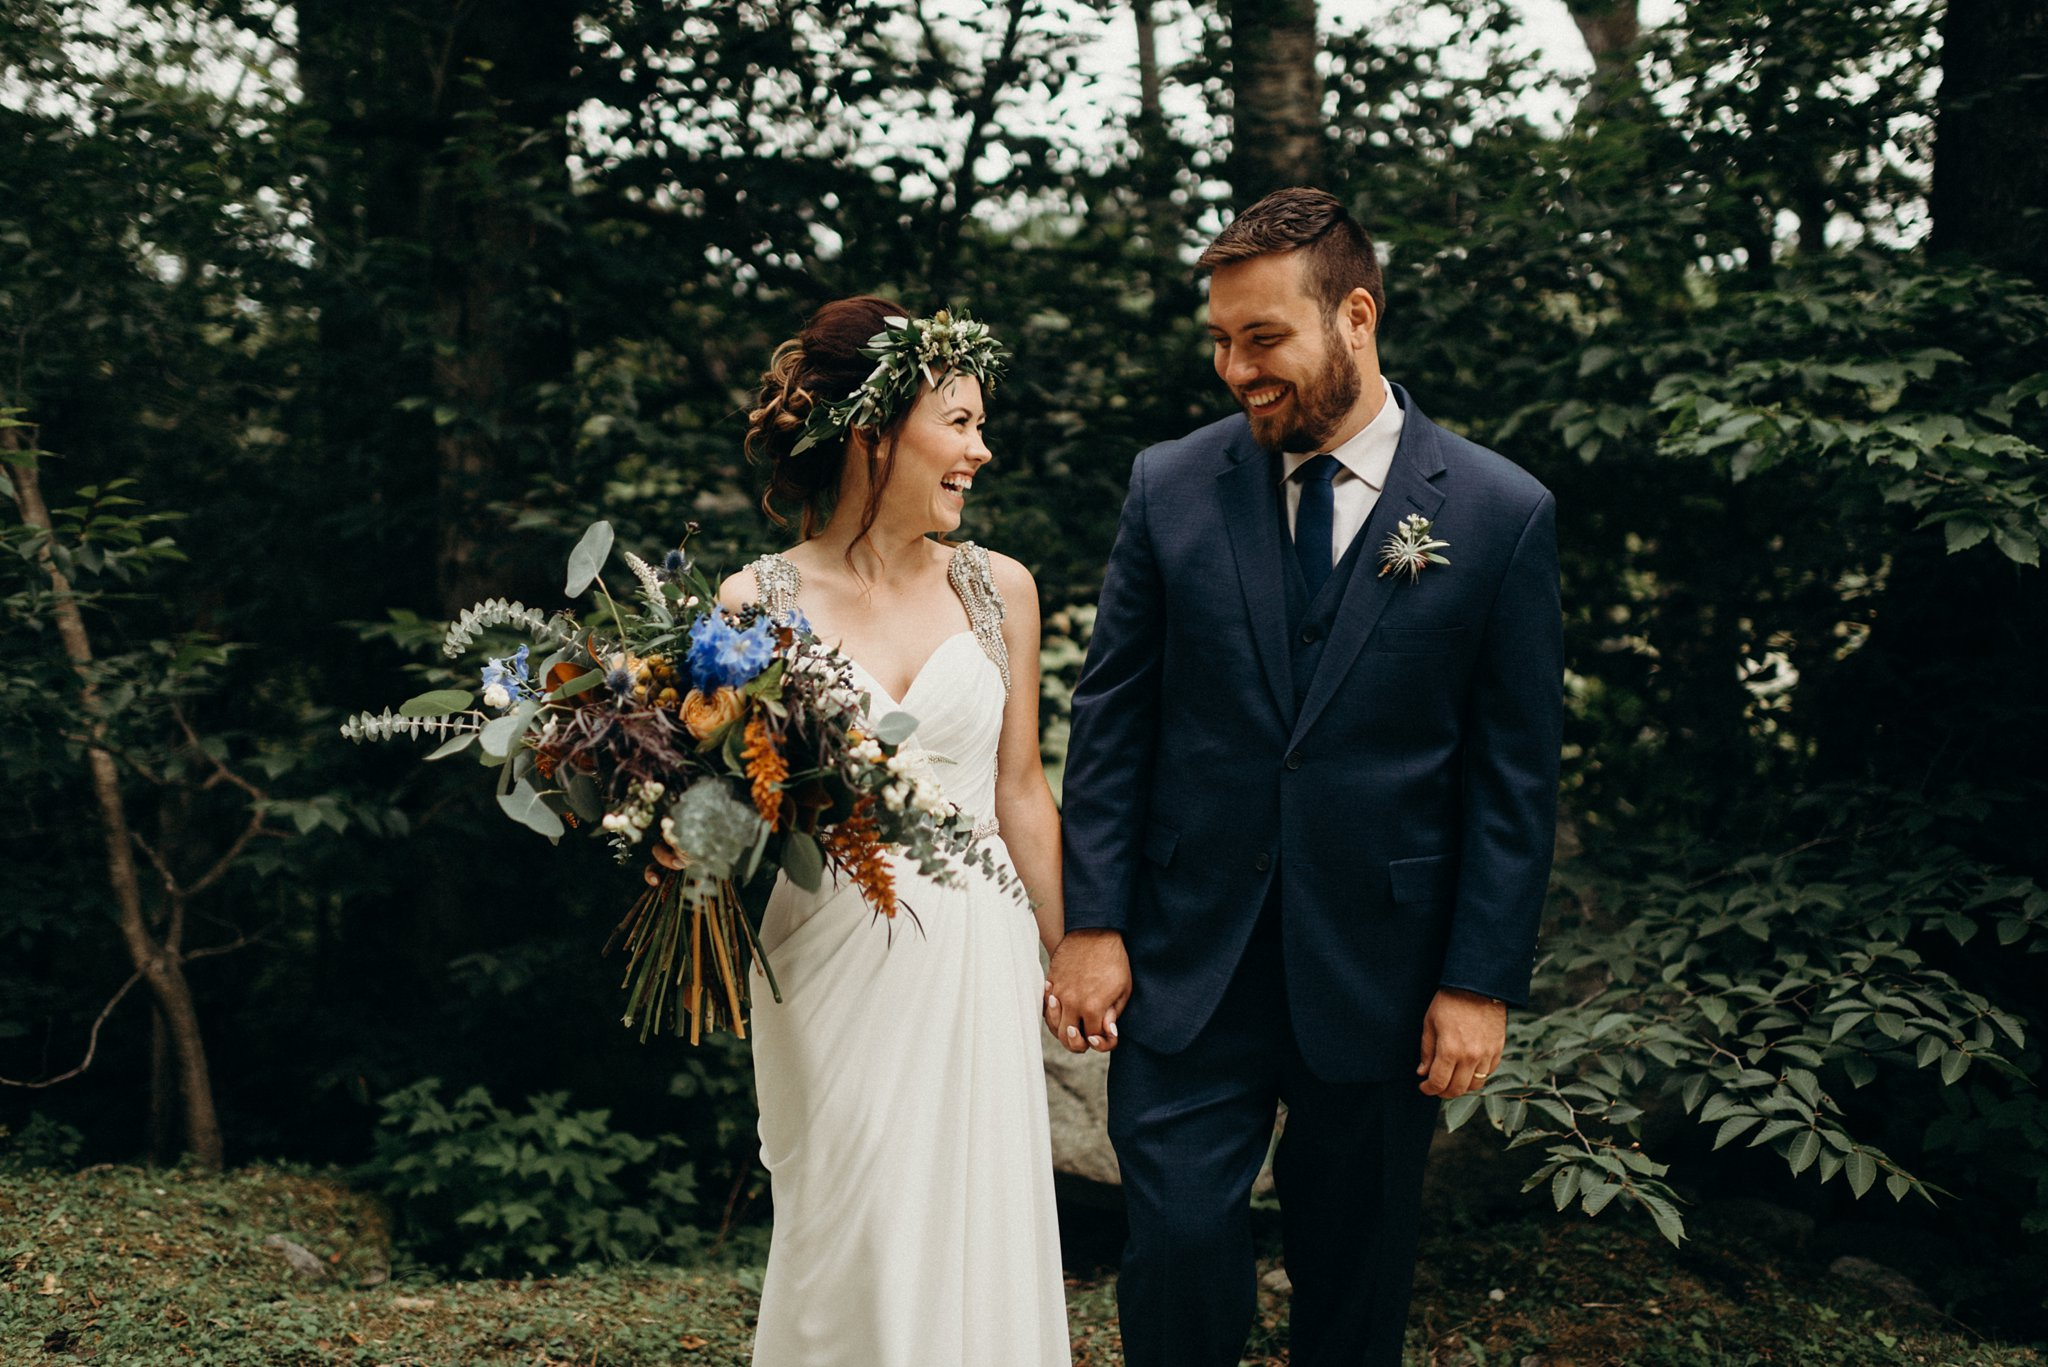 kaihla_tonai_intimate_wedding_elopement_photographer_6601.jpg